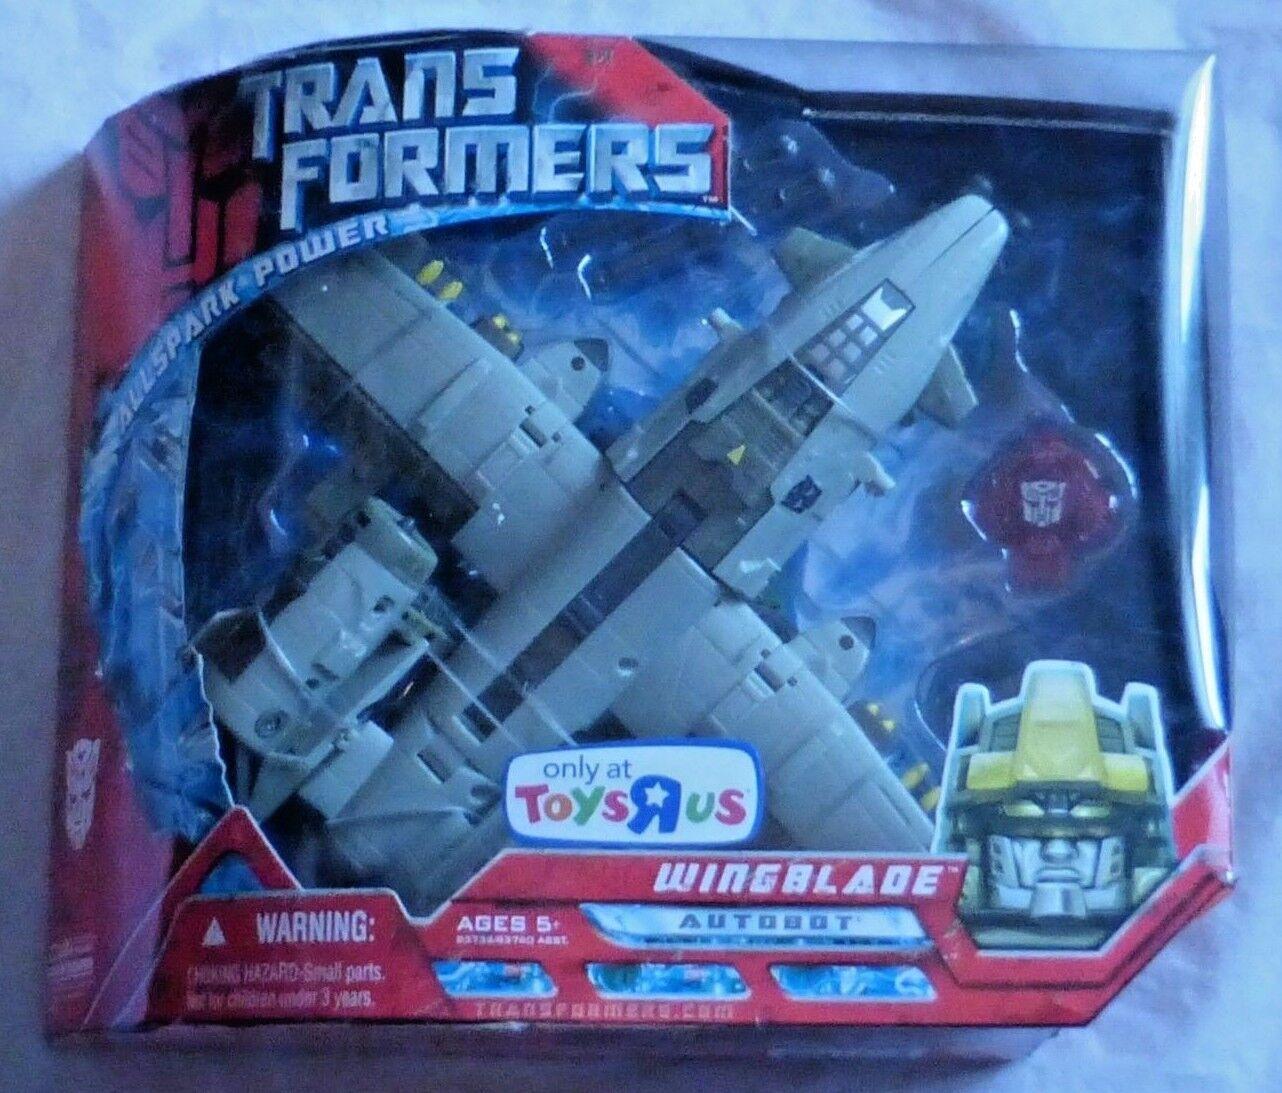 Hasbro Transformers Film Winglblade Action Figure Misb Sigillato Tru Esclusivo